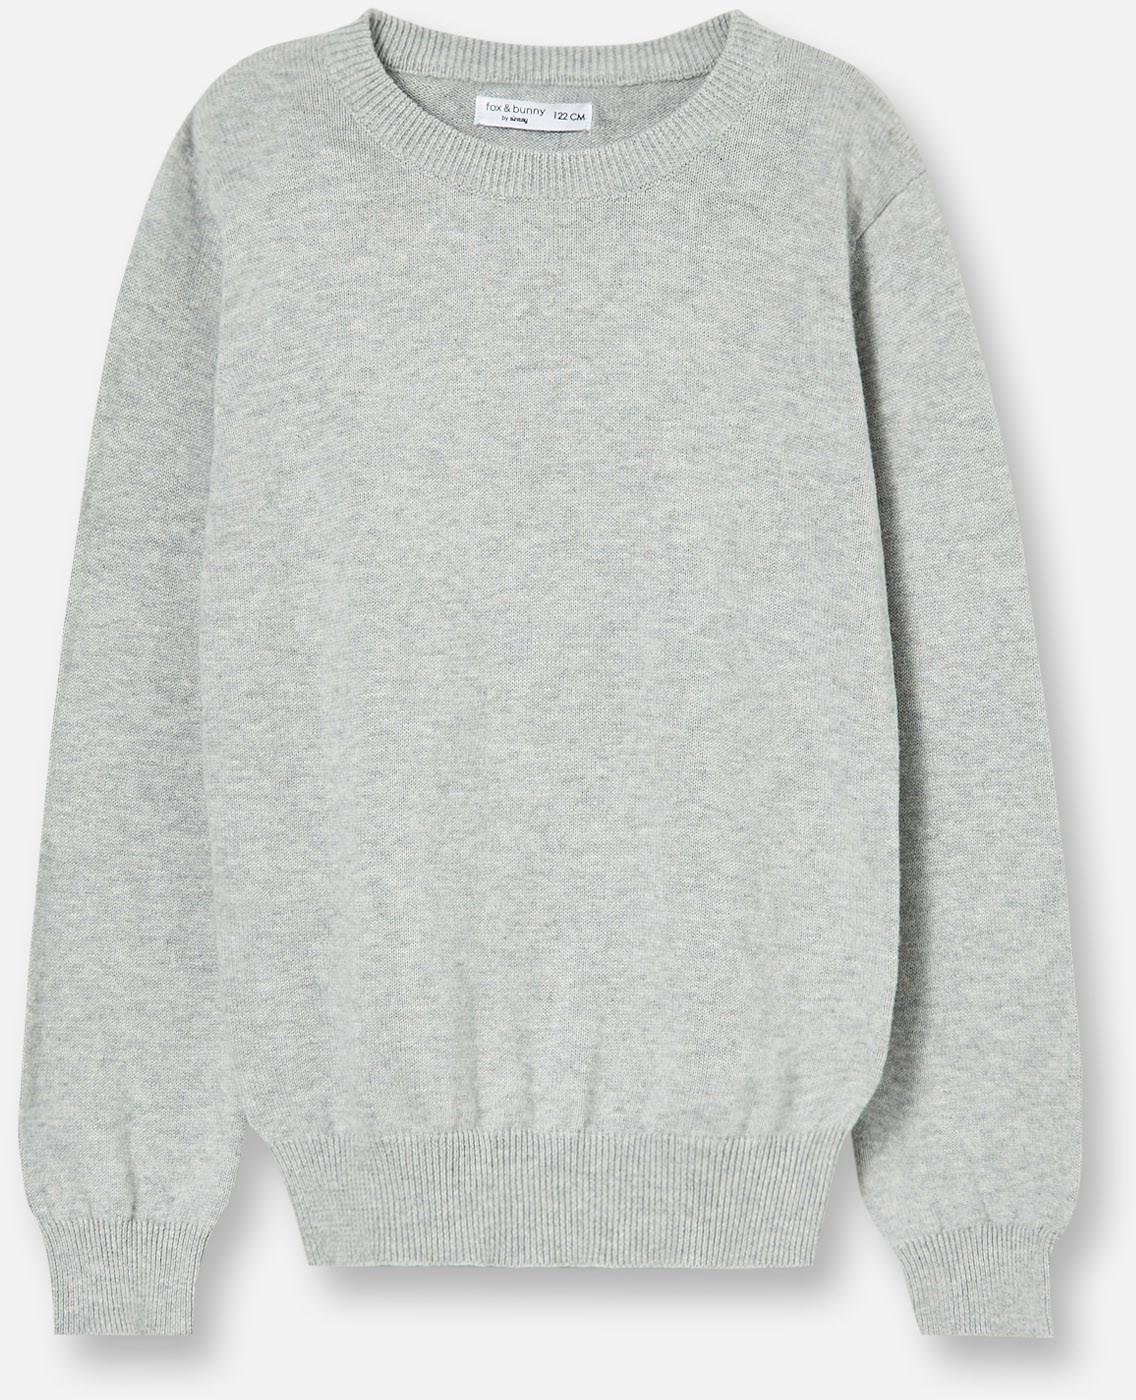 Sinsay Sinsay - Ciepły sweter - Szary